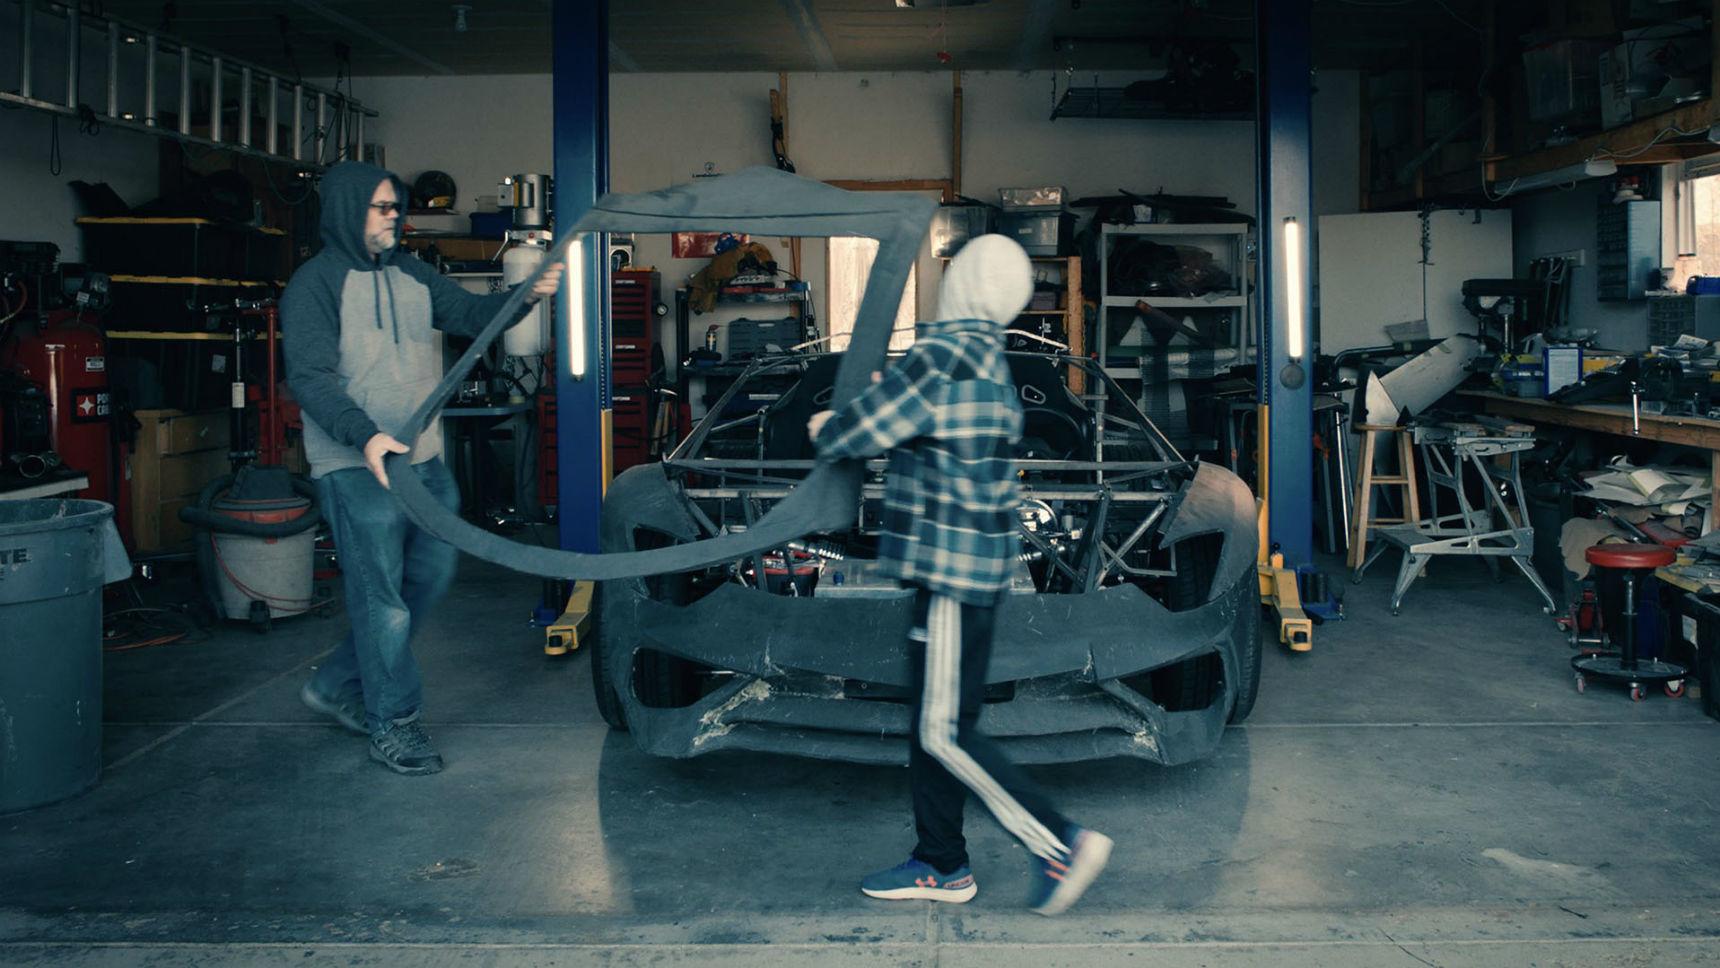 Создатели реплики Lamborghini получили на Рождество настоящий суперкар